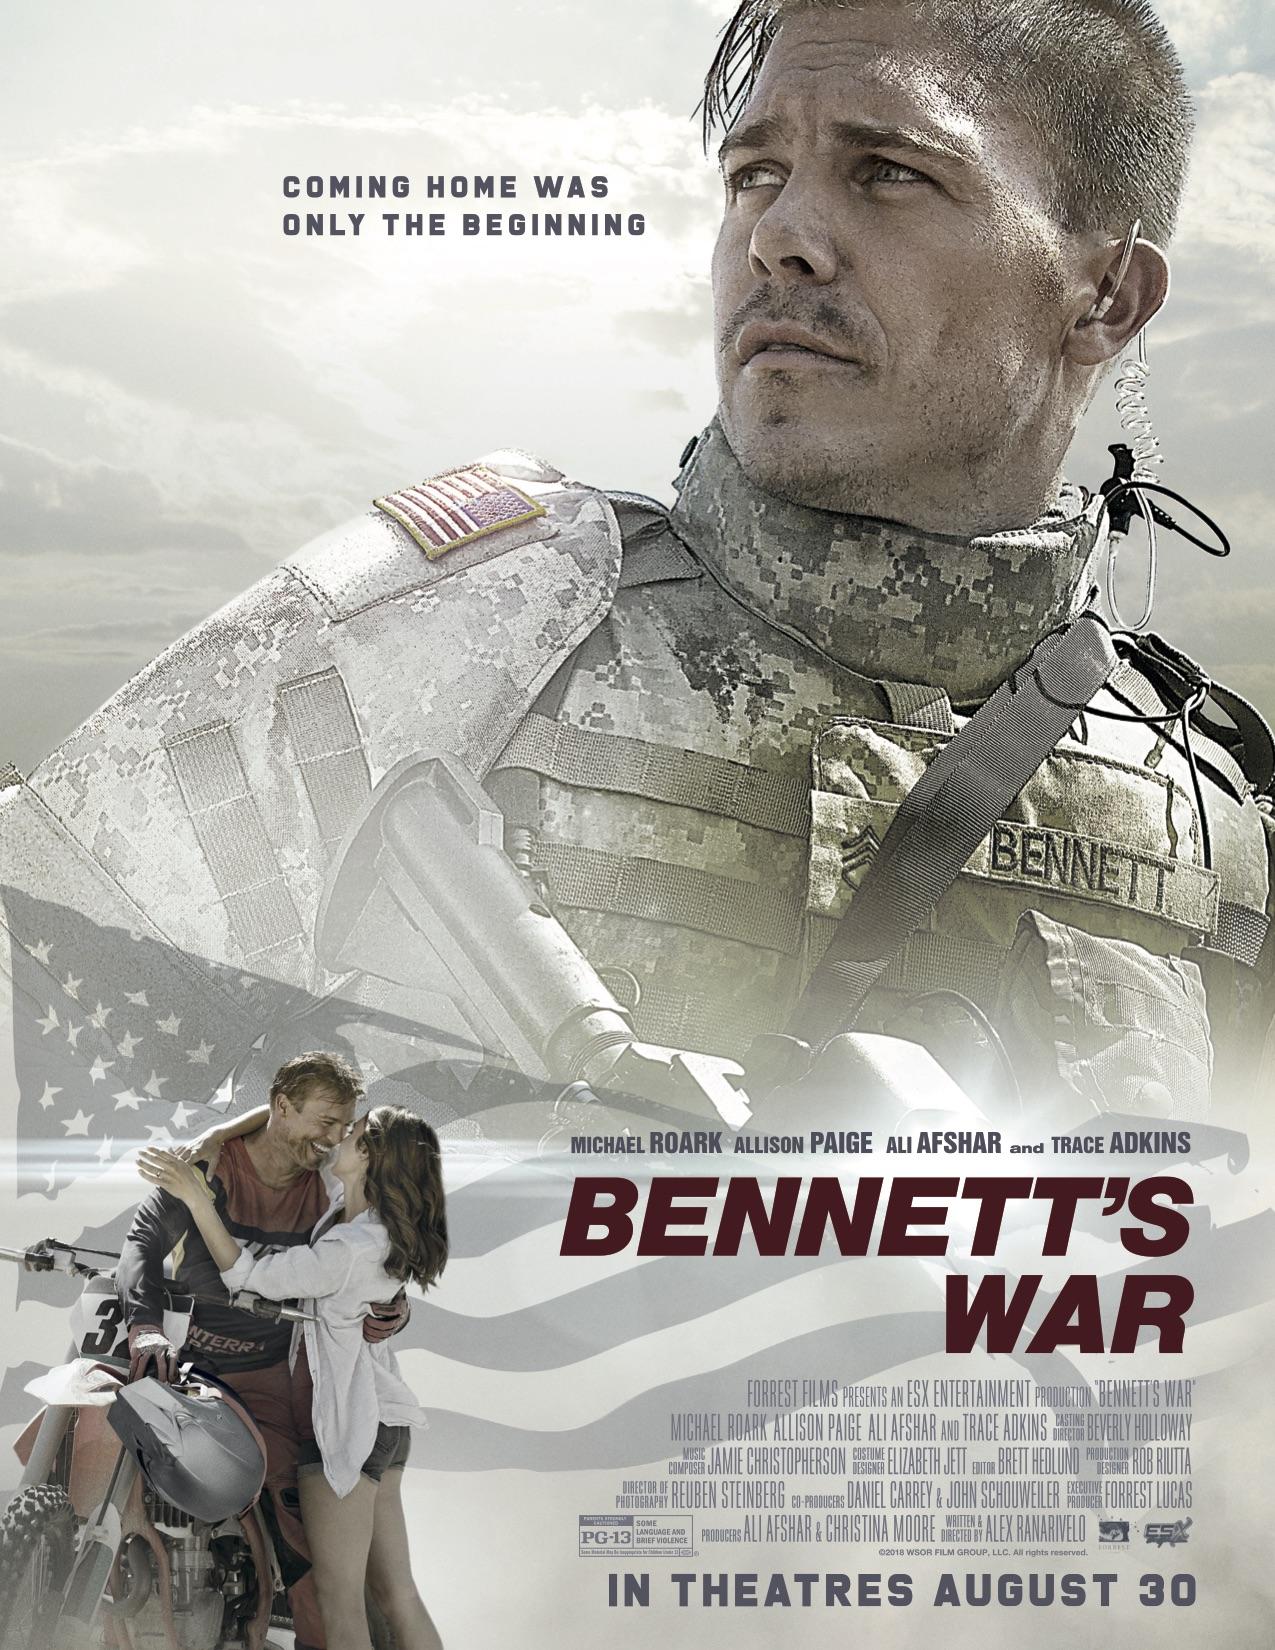 Bennetts War_Mini 1sheet flyer_1_Hi Res Cropped.jpg